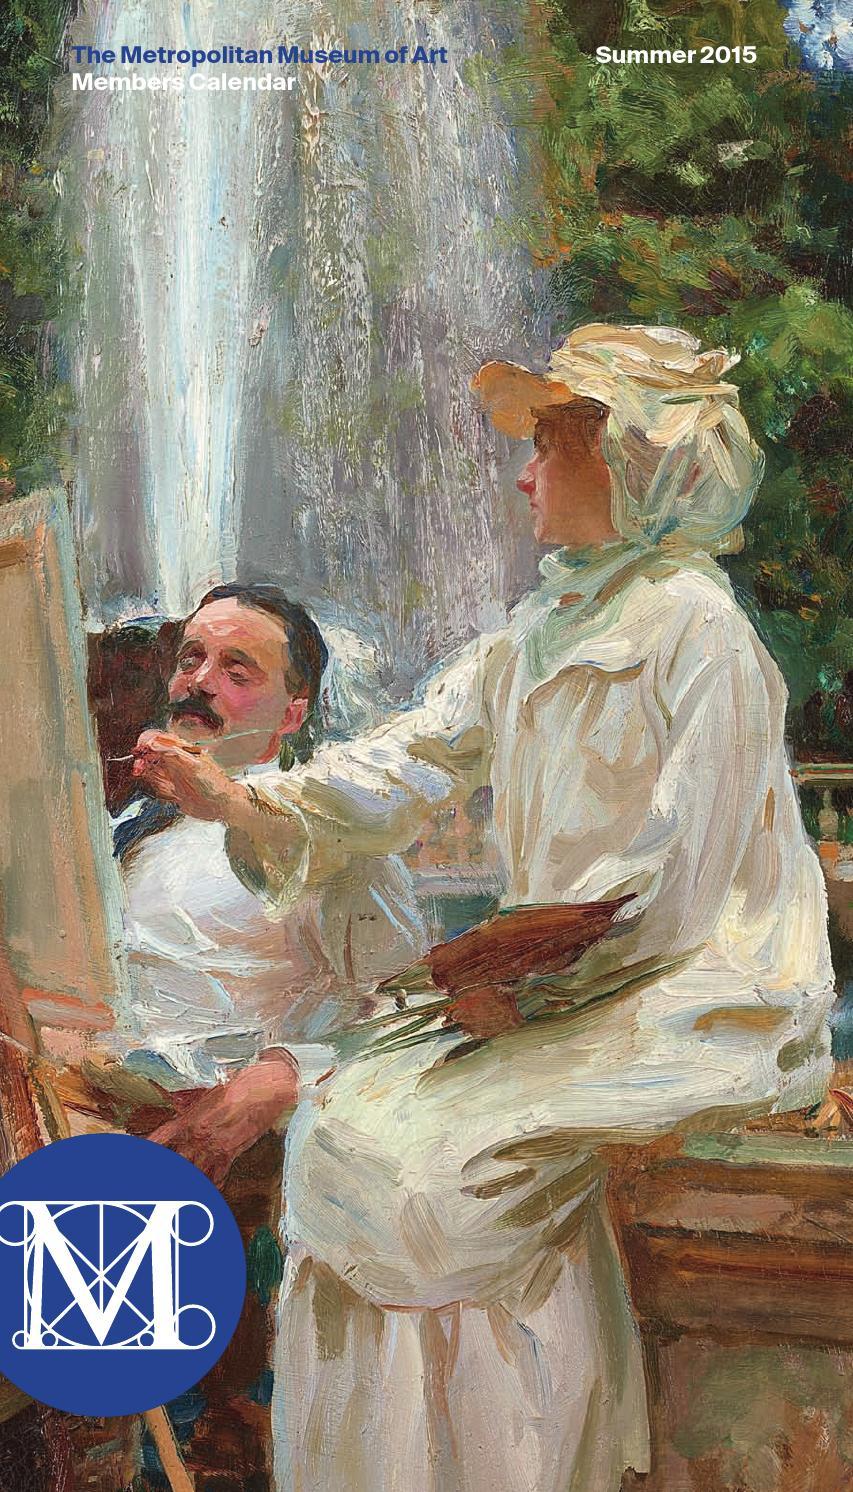 Met Art Calendar : Members calendar summer by the metropolitan museum